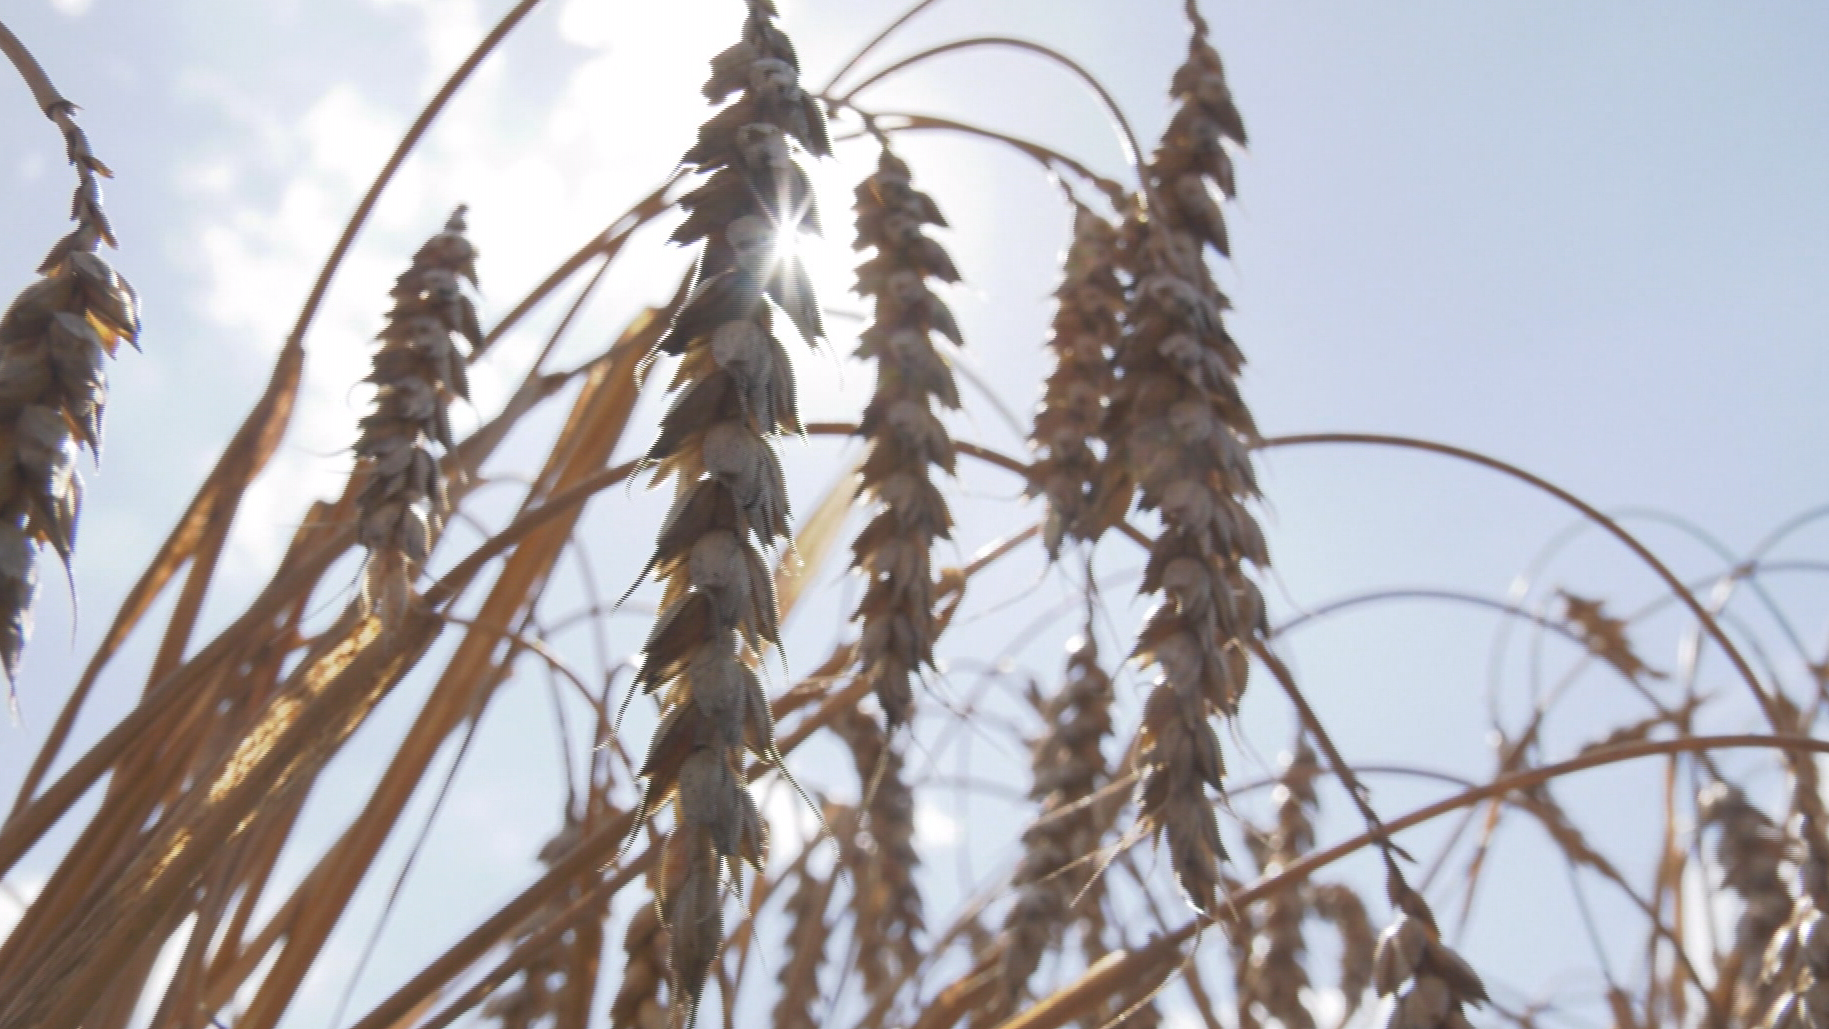 zerno - Аграрии Витебской области намолотили миллион тонн зерна (видео)